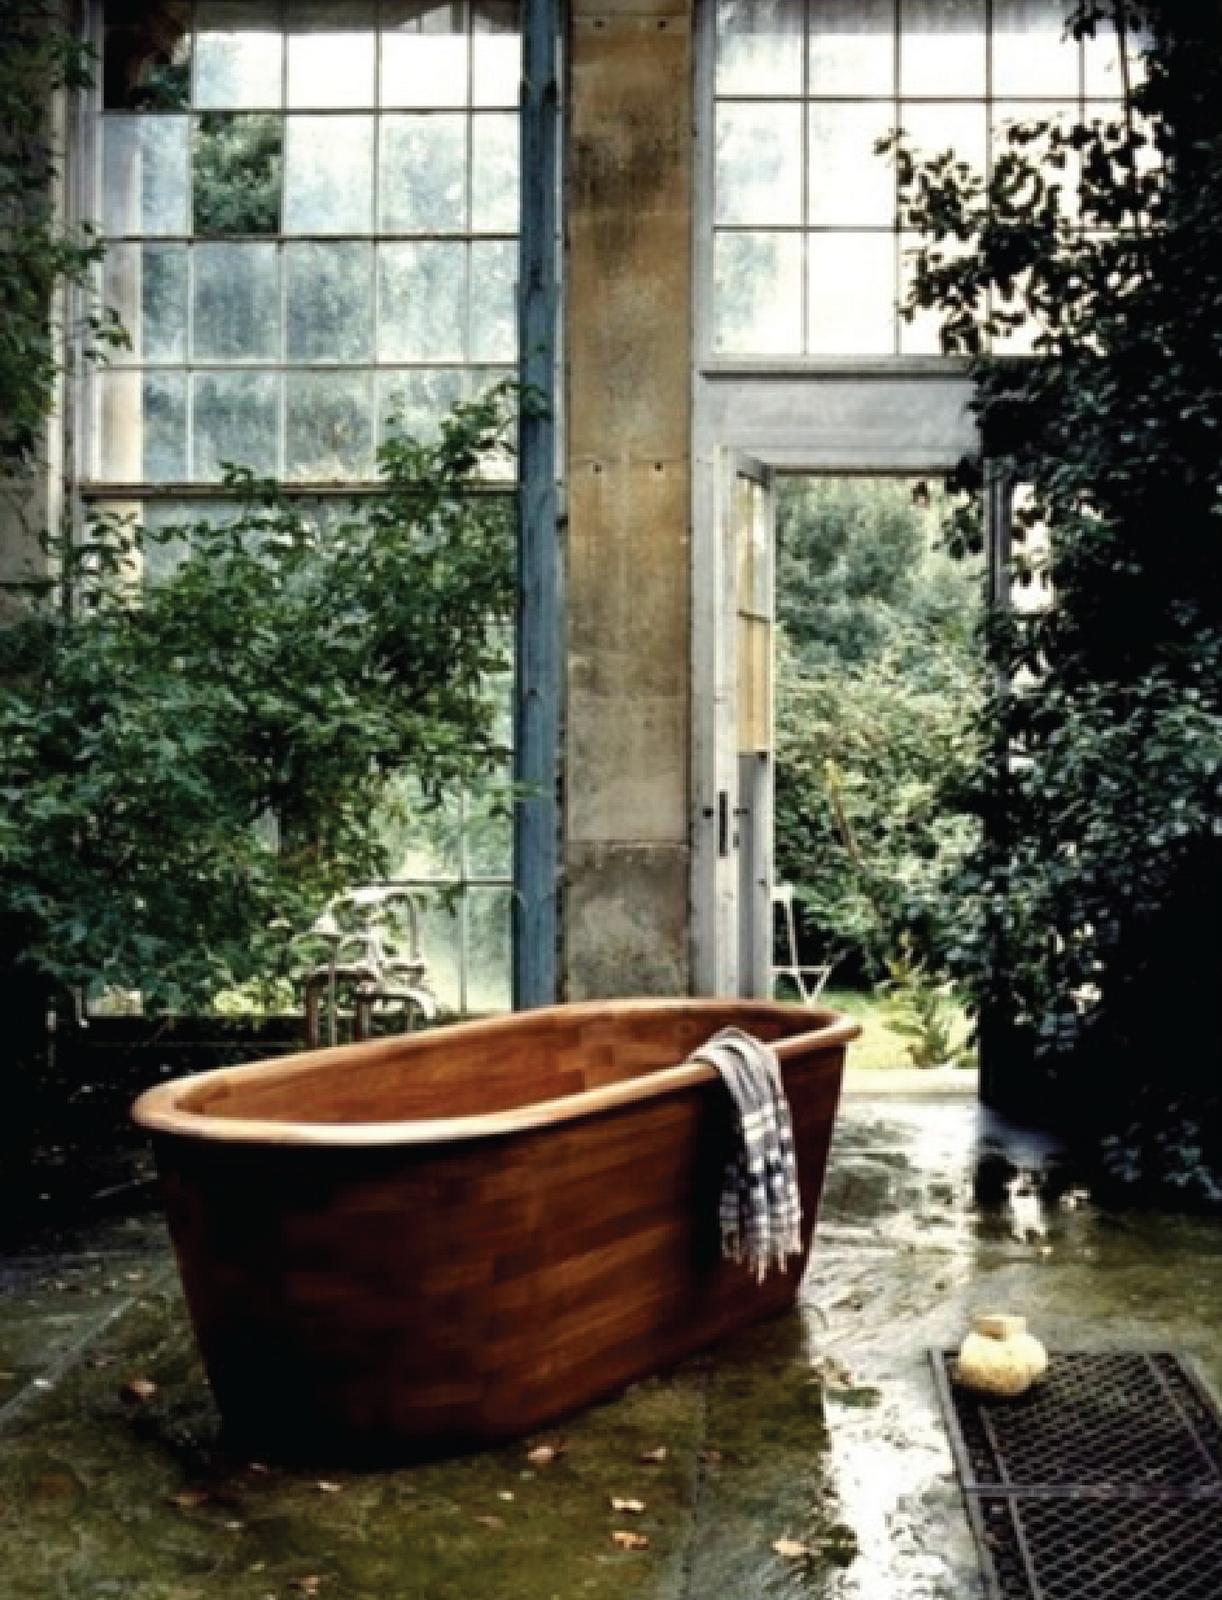 Wooden Bathtub Http Wwwmanufacturedhomepartsinfocom Manufacturedhomebathtubs